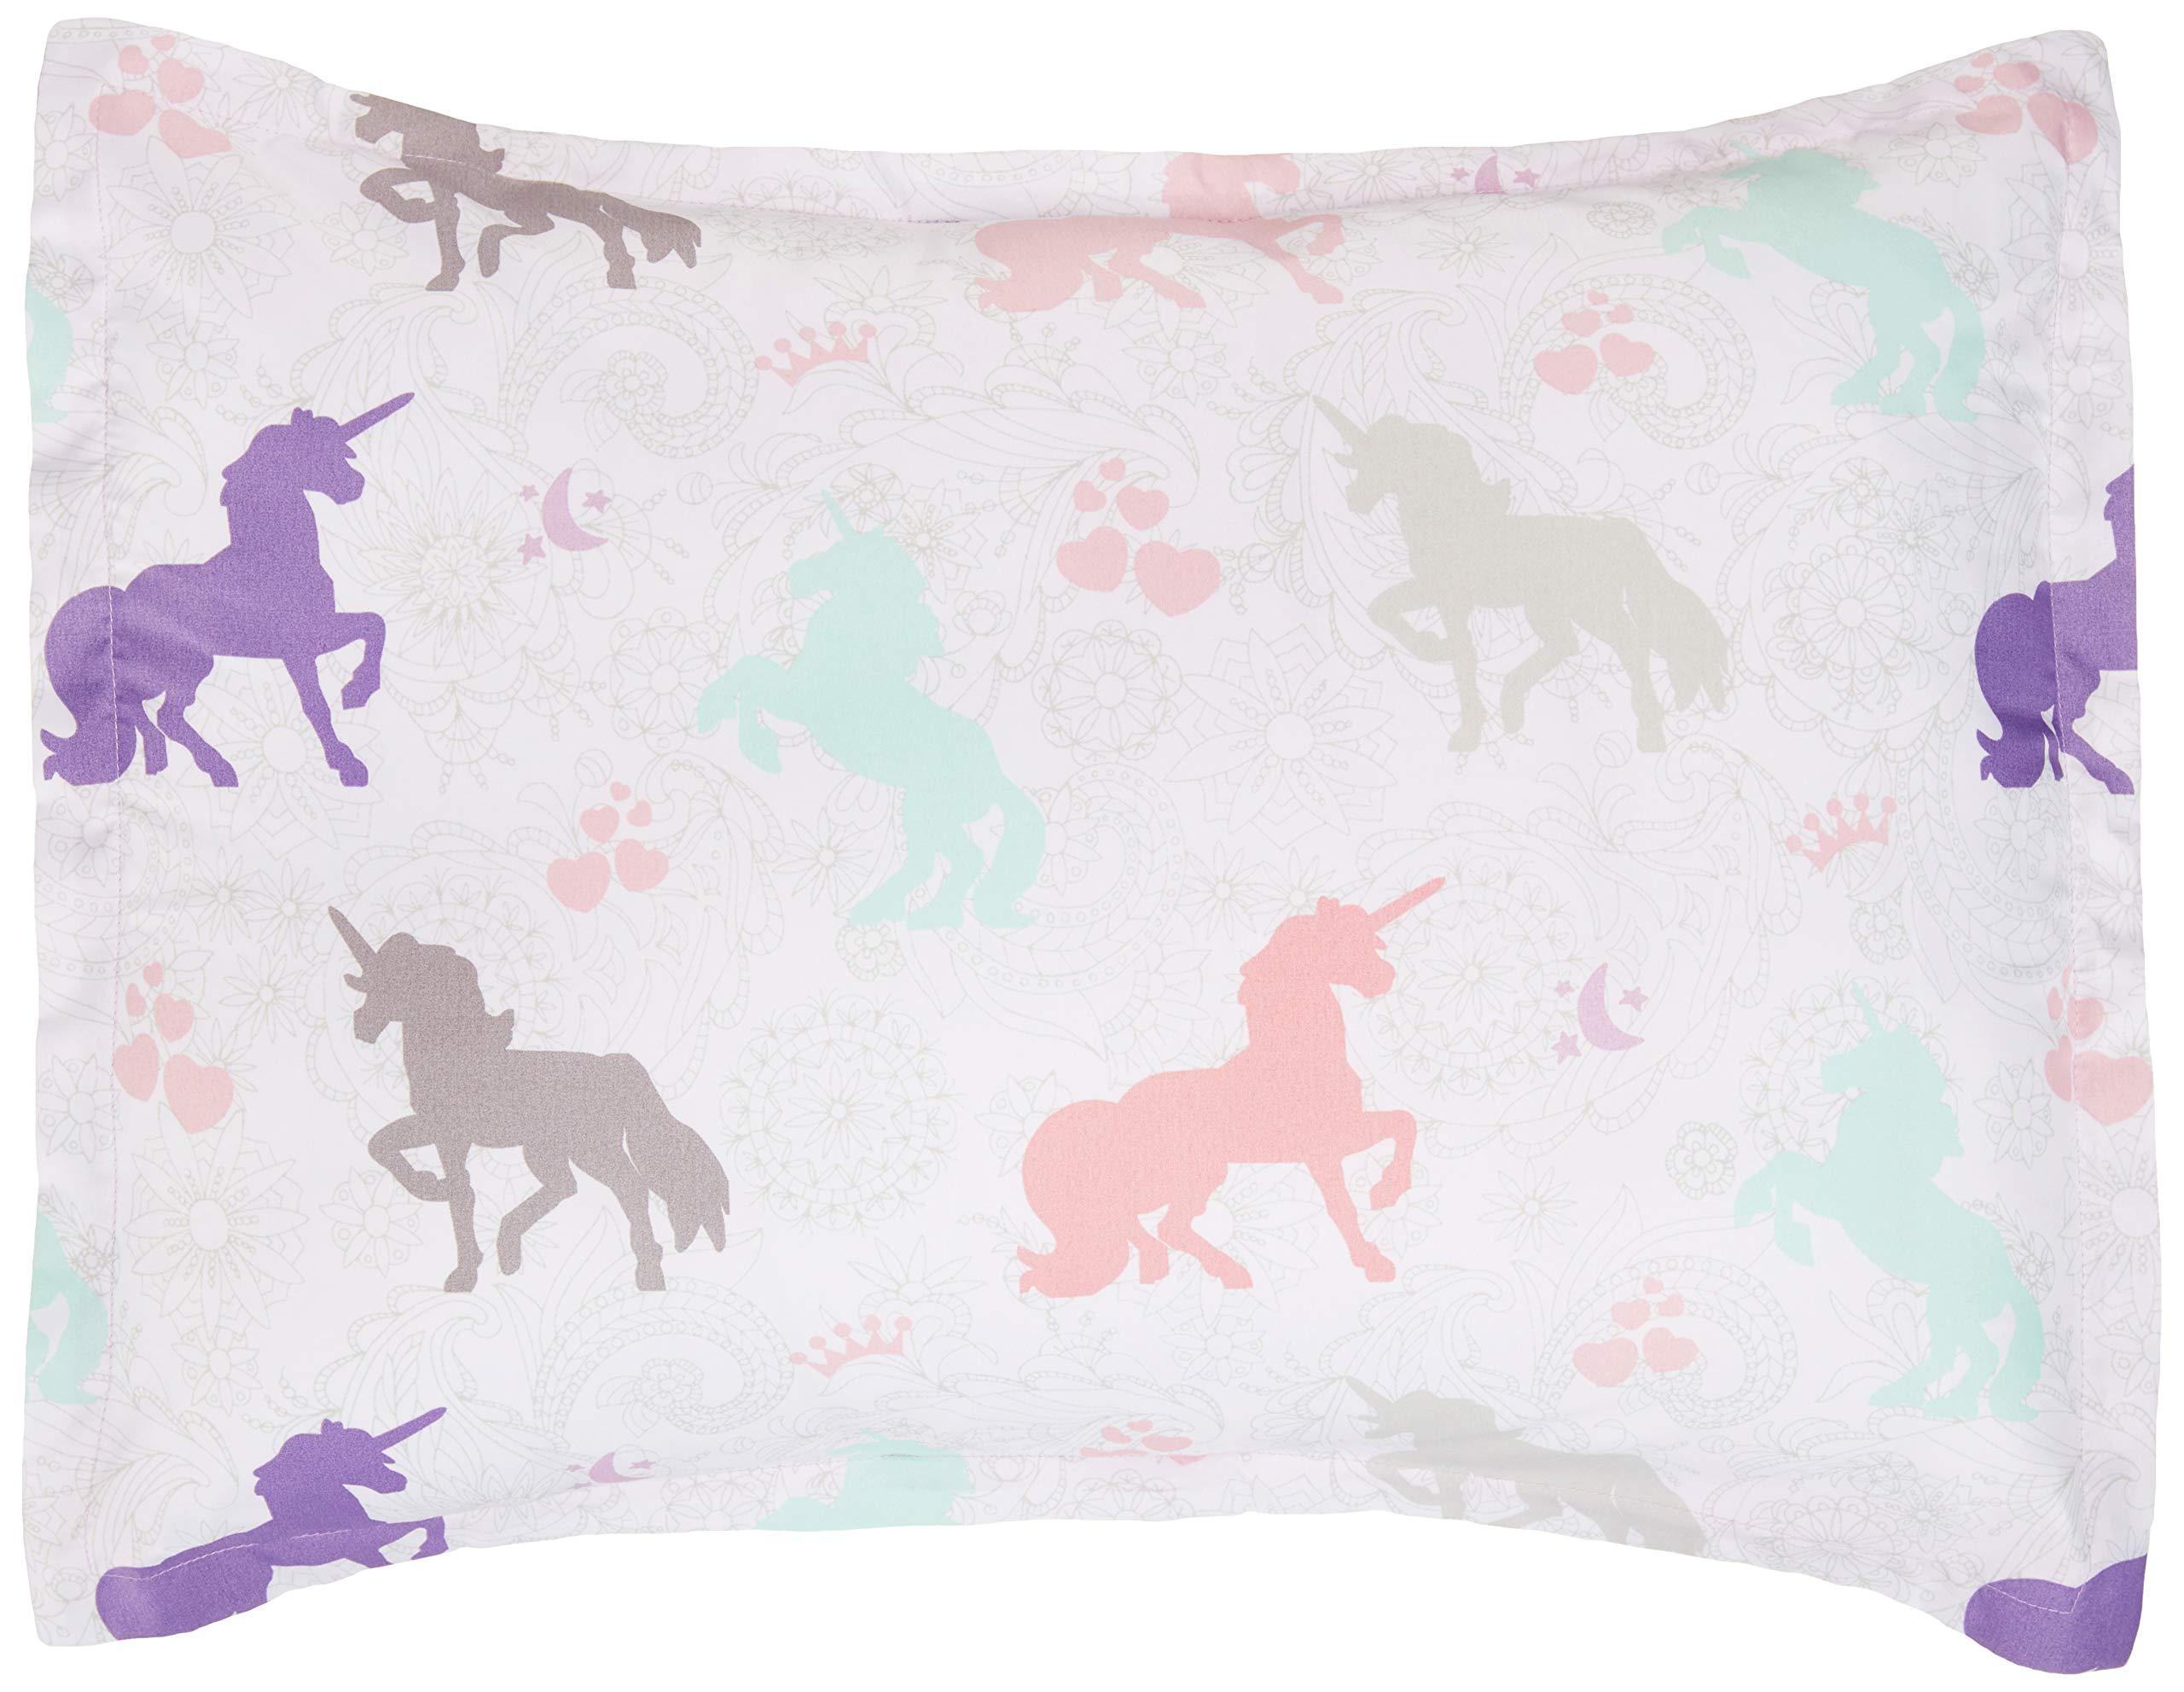 AmazonBasics Kid's Comforter Set - Soft, Easy-Wash Microfiber - Twin, Purple Unicorns by AmazonBasics (Image #4)